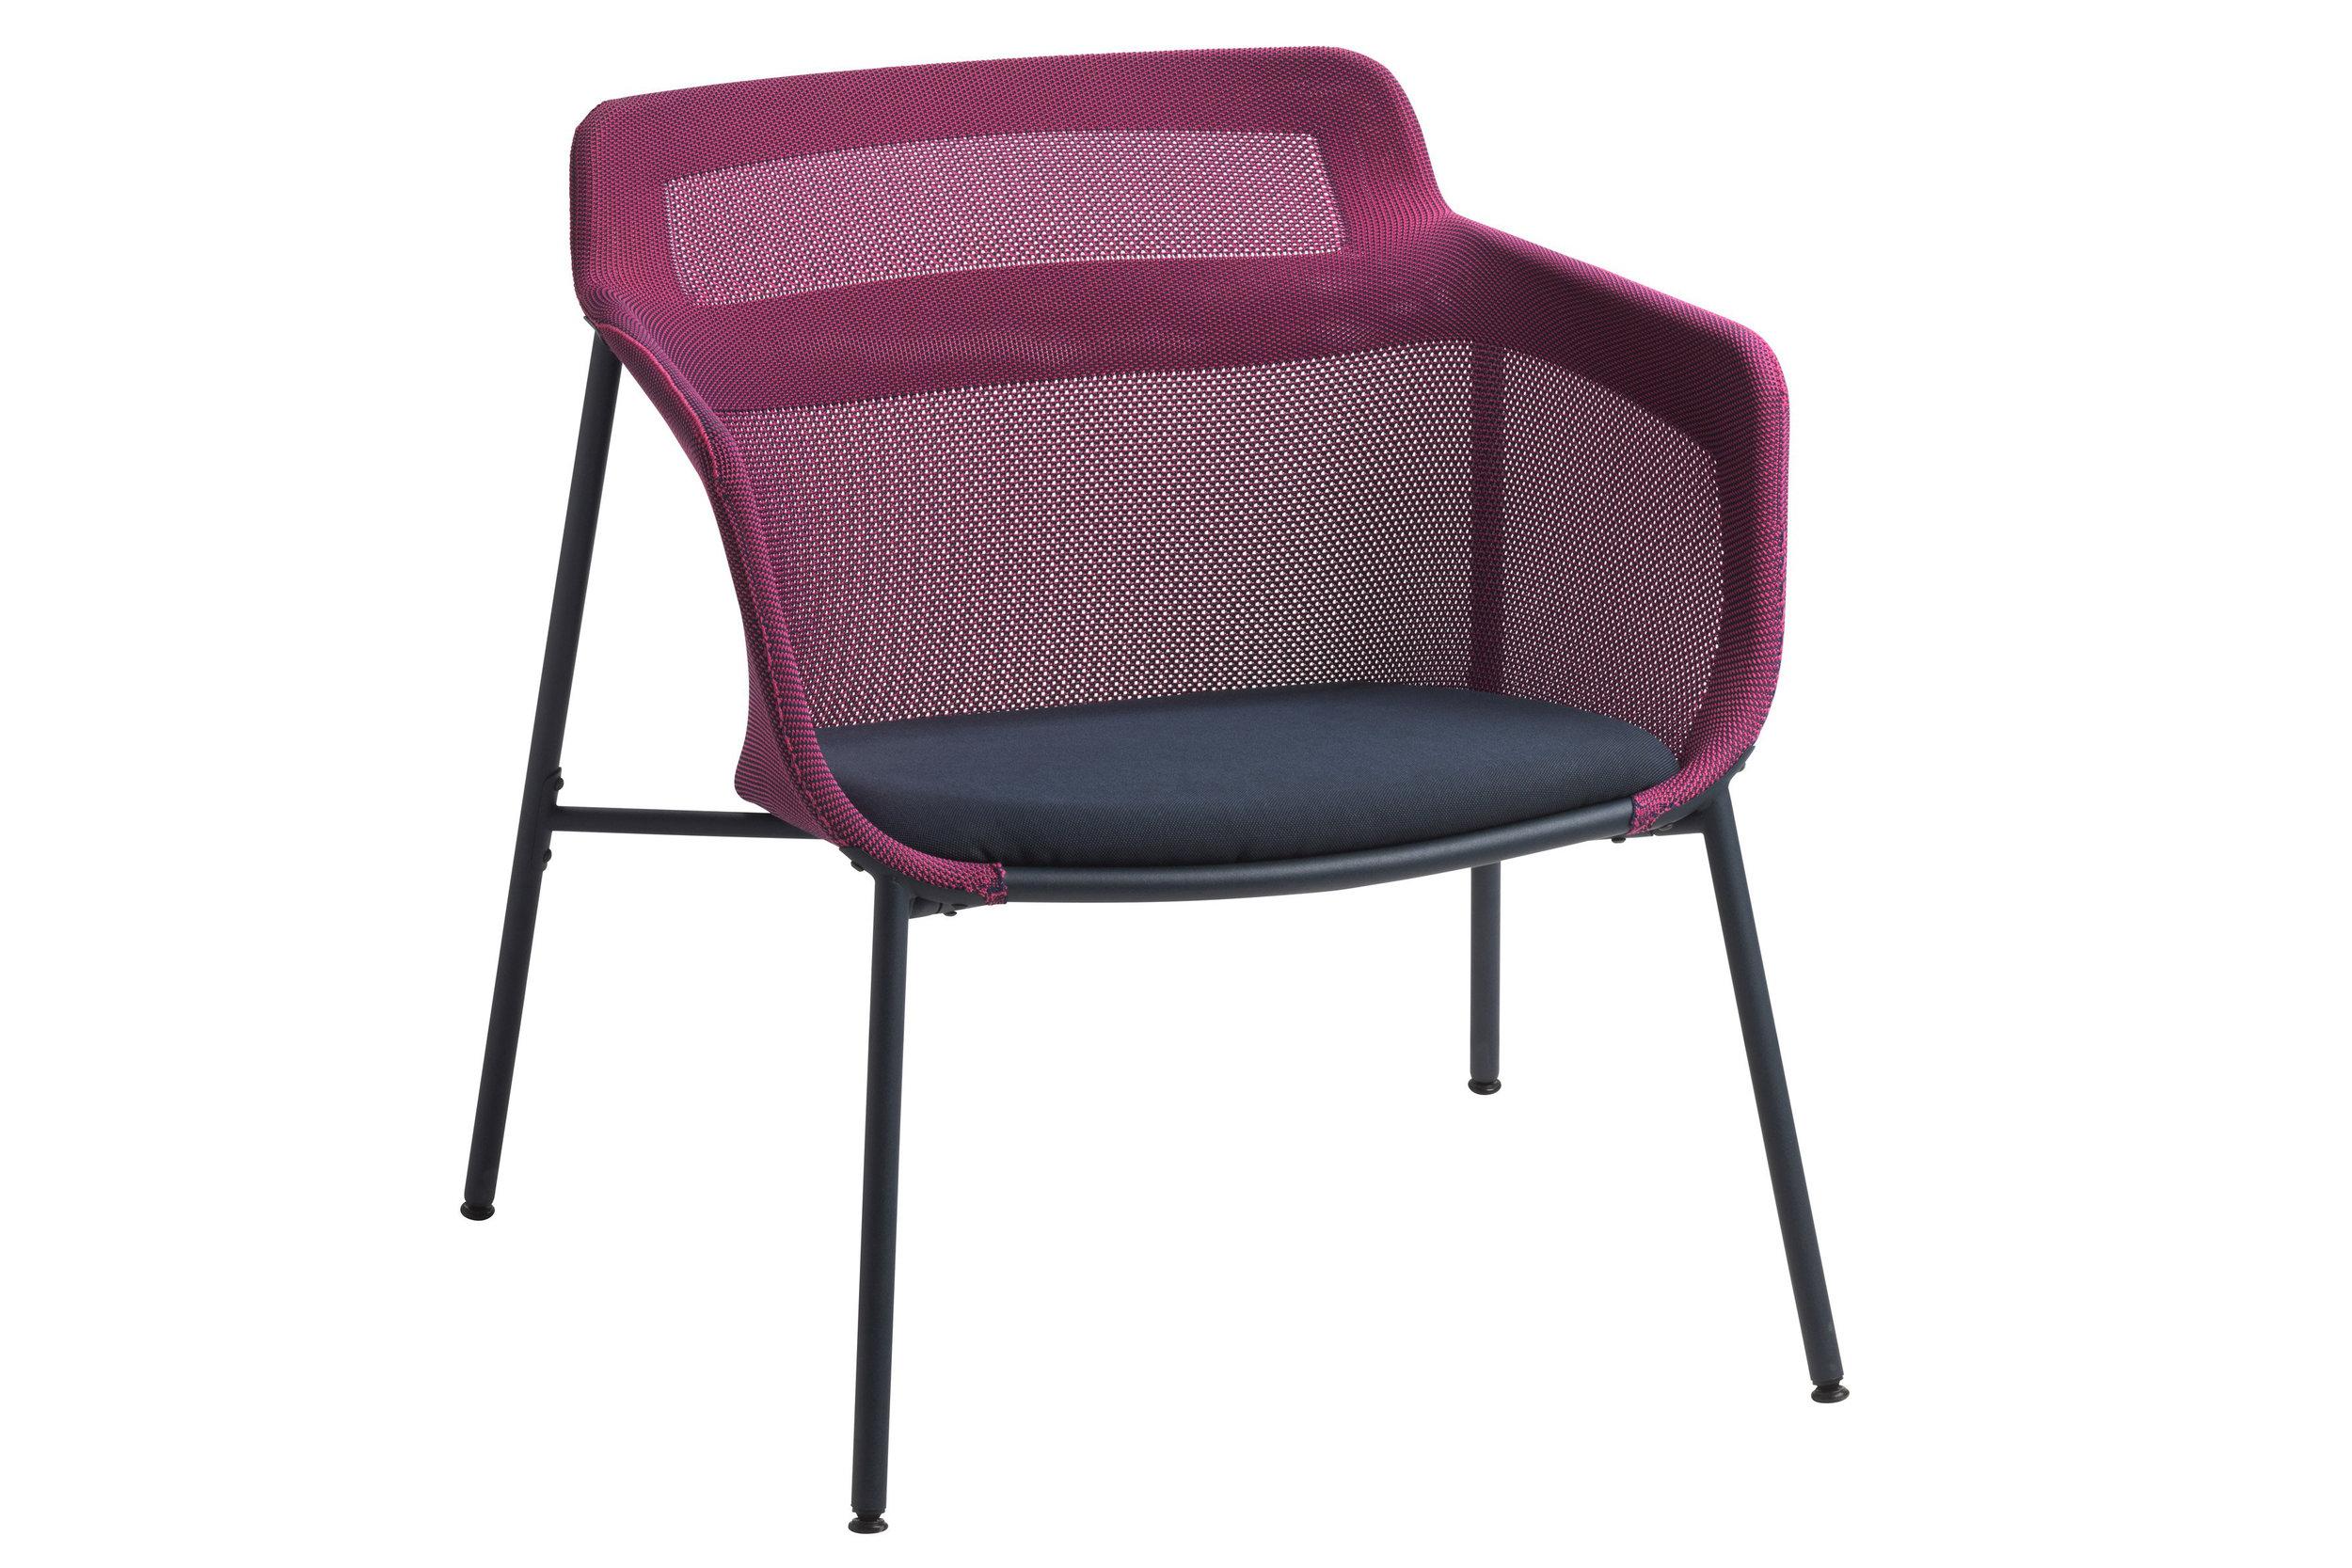 ikea-ps-2017-matali-crasset-furniture-chair-design_dezeen_2364_col_3.jpg